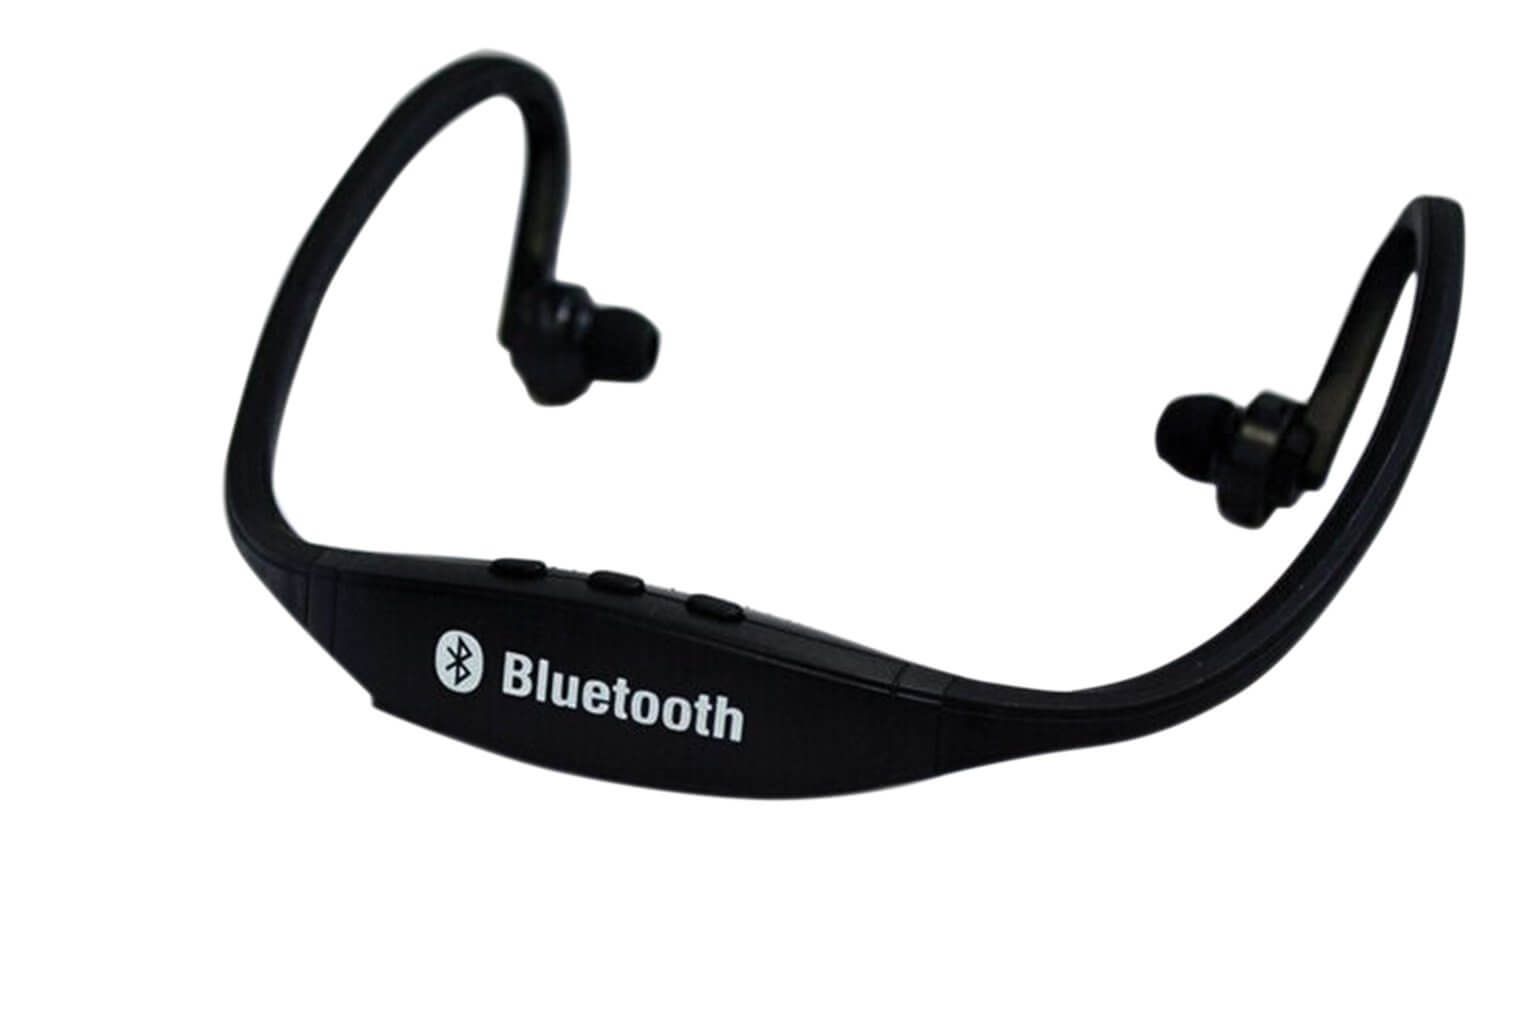 Soundlab Wireless Bluetooth Headphones V3.0